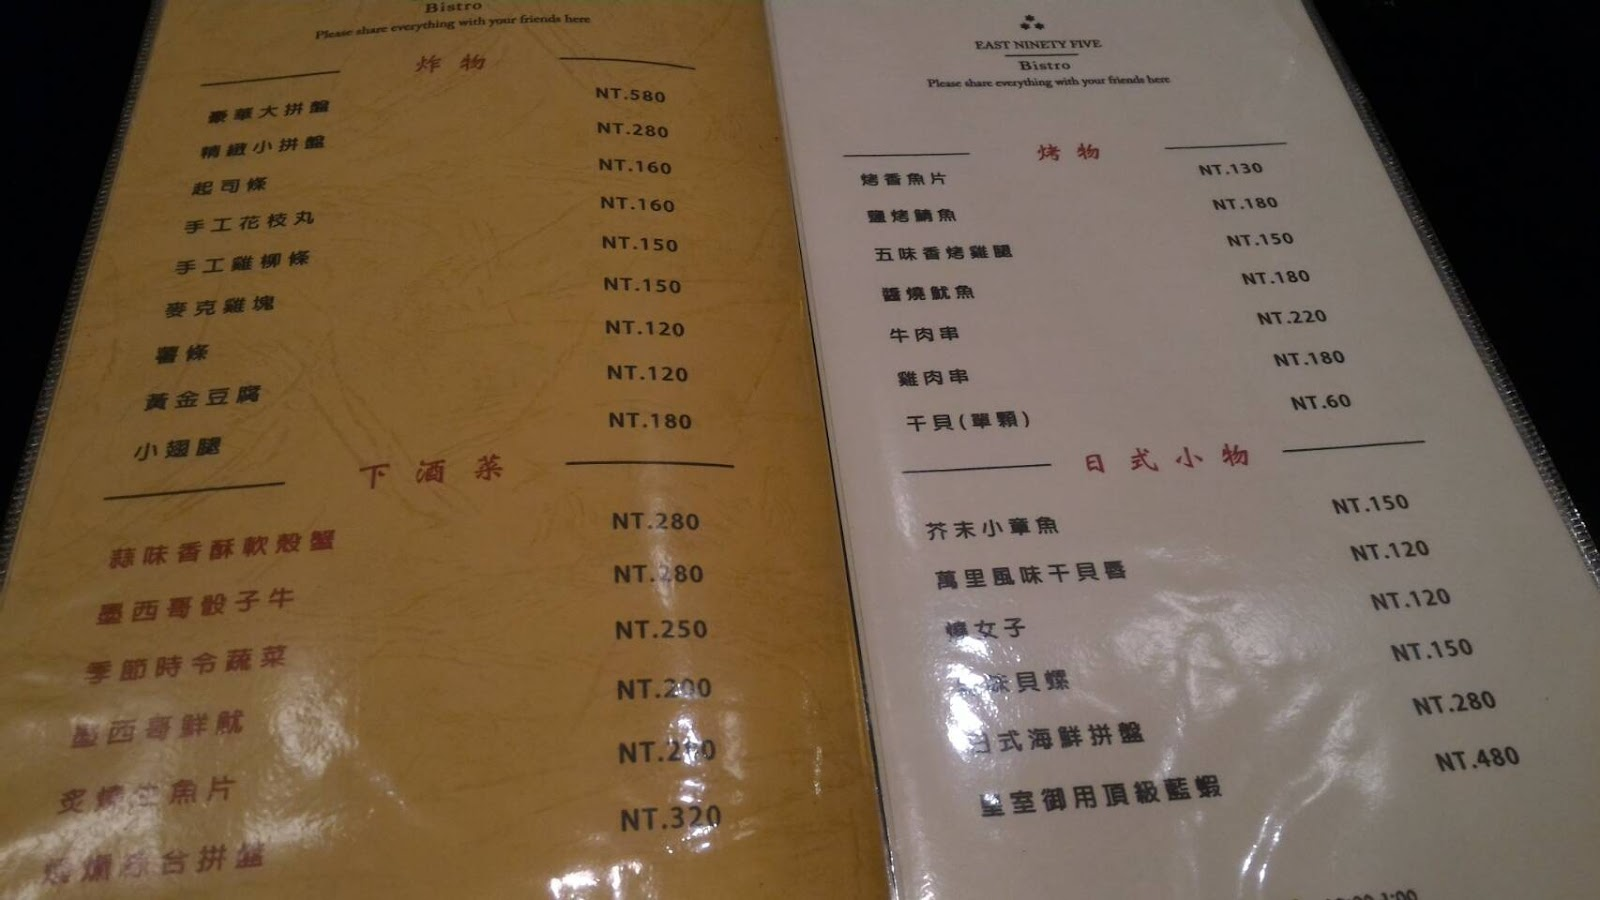 E95餐酒館菜單 評價